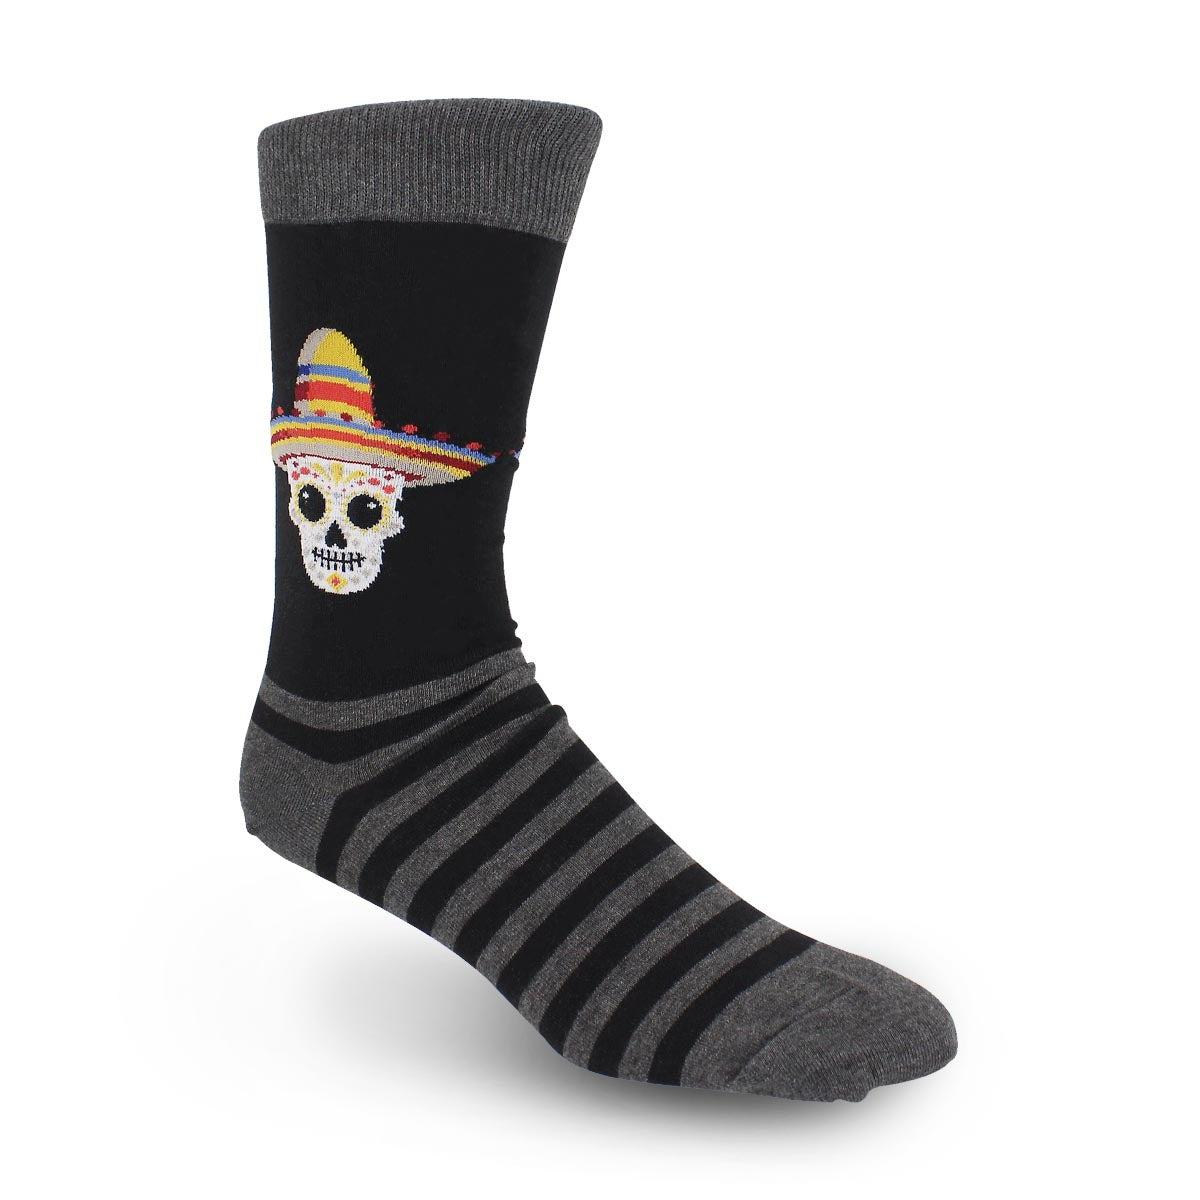 Mns Sombrero Sugar Skull bk printed sock